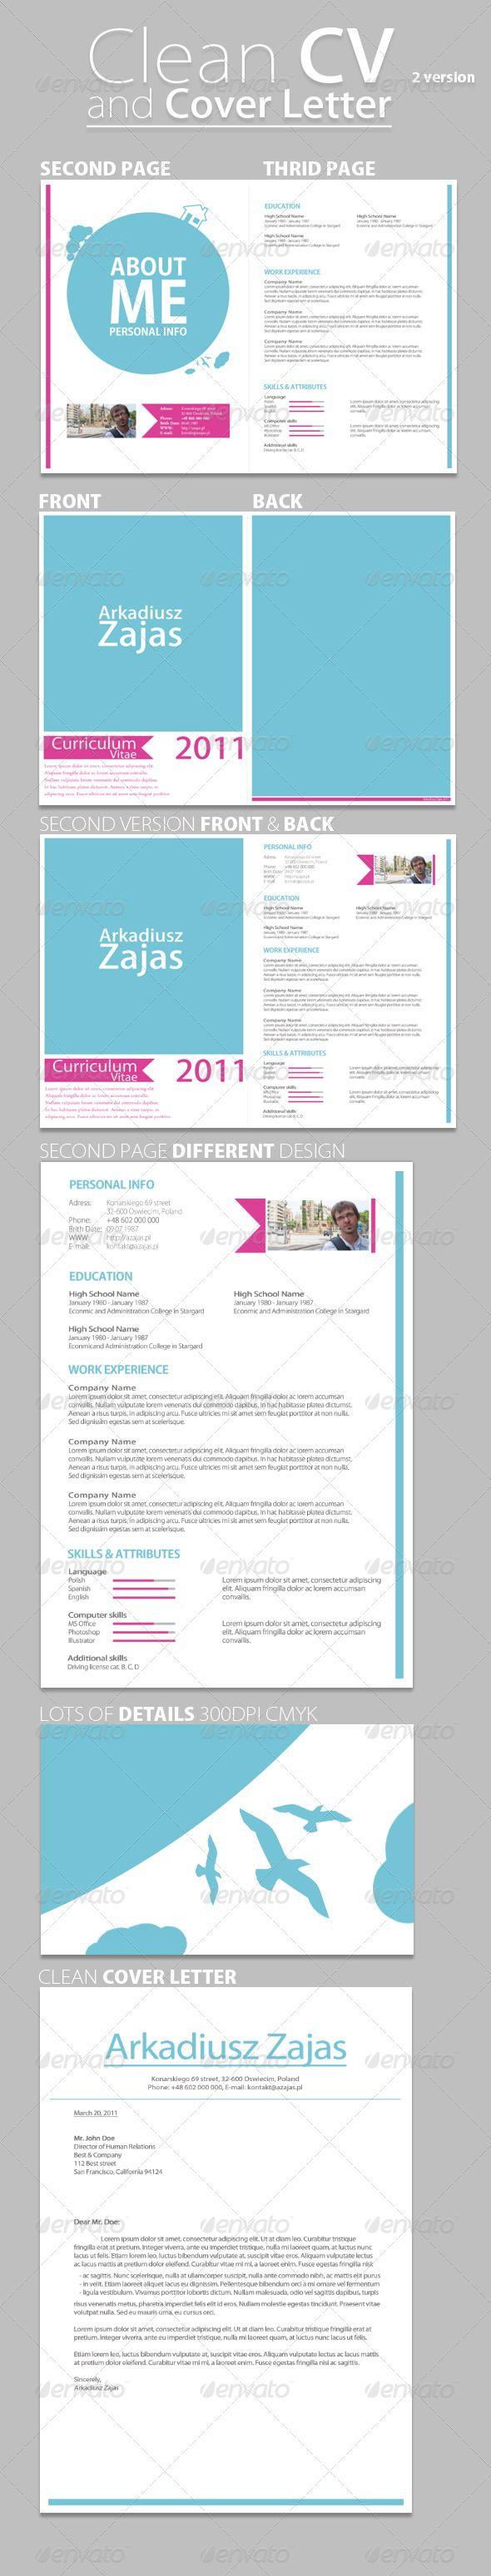 Best 20 Cv Cover Letter Ideas On Pinterest Employment Cover